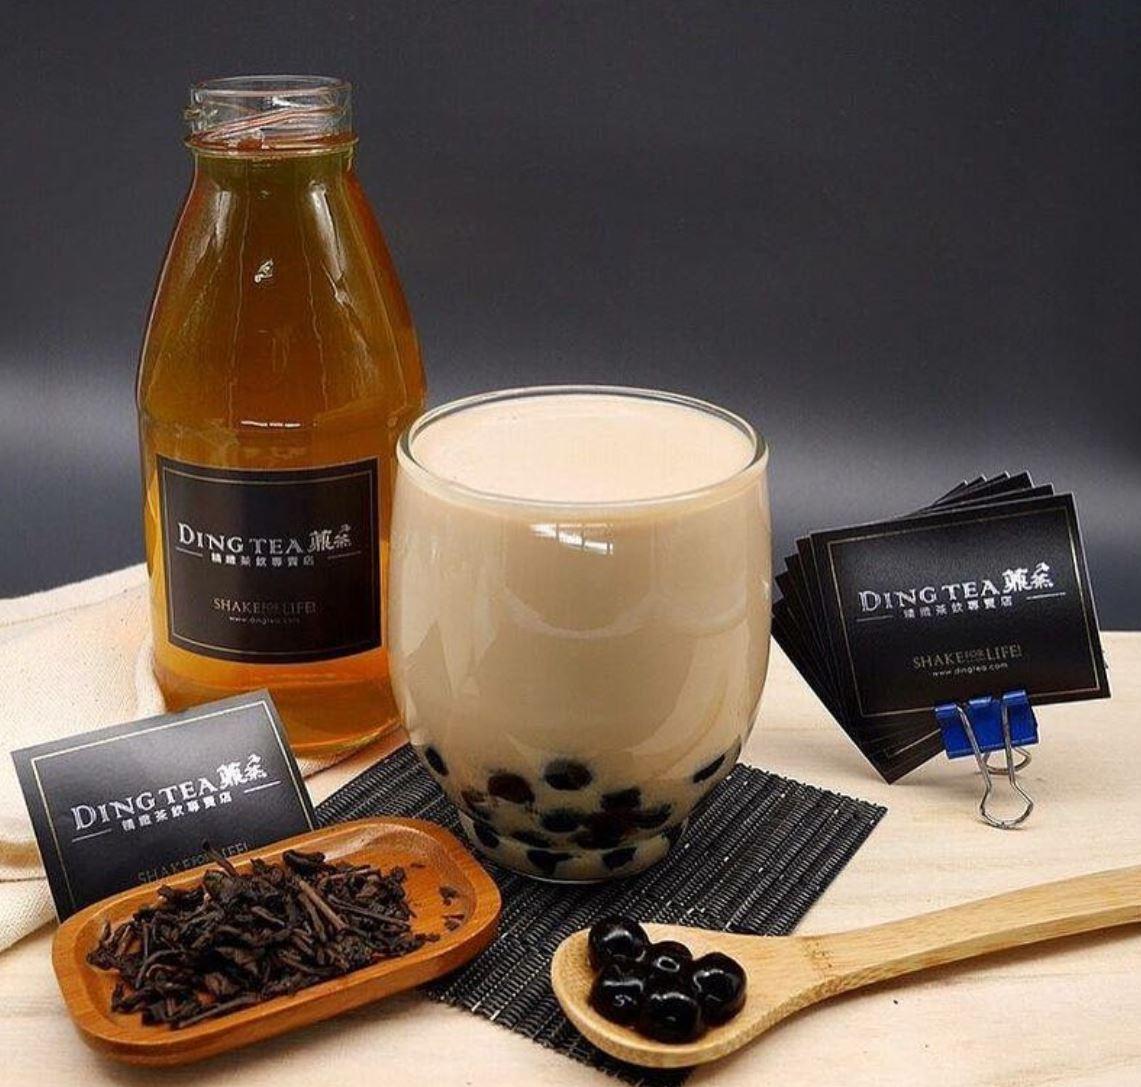 April 6 - 7   New Ding Tea Opens in Costa Mesa - BOGO 50% Off Drinks